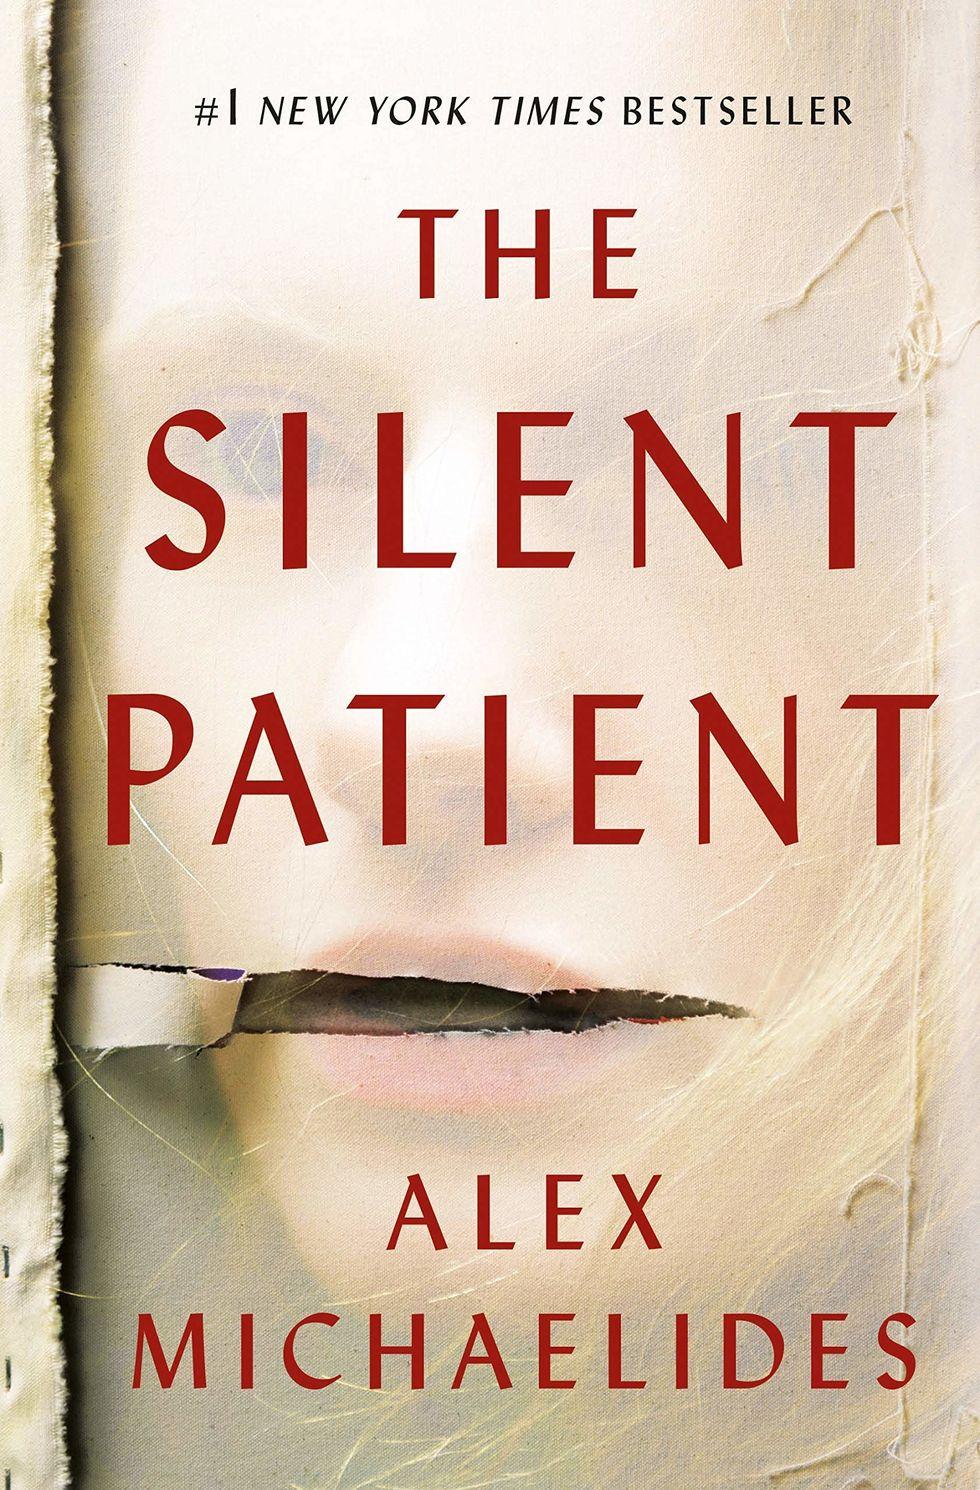 """The Silent Patient"" by Alex Michaelides Is The Best Summer Thriller"